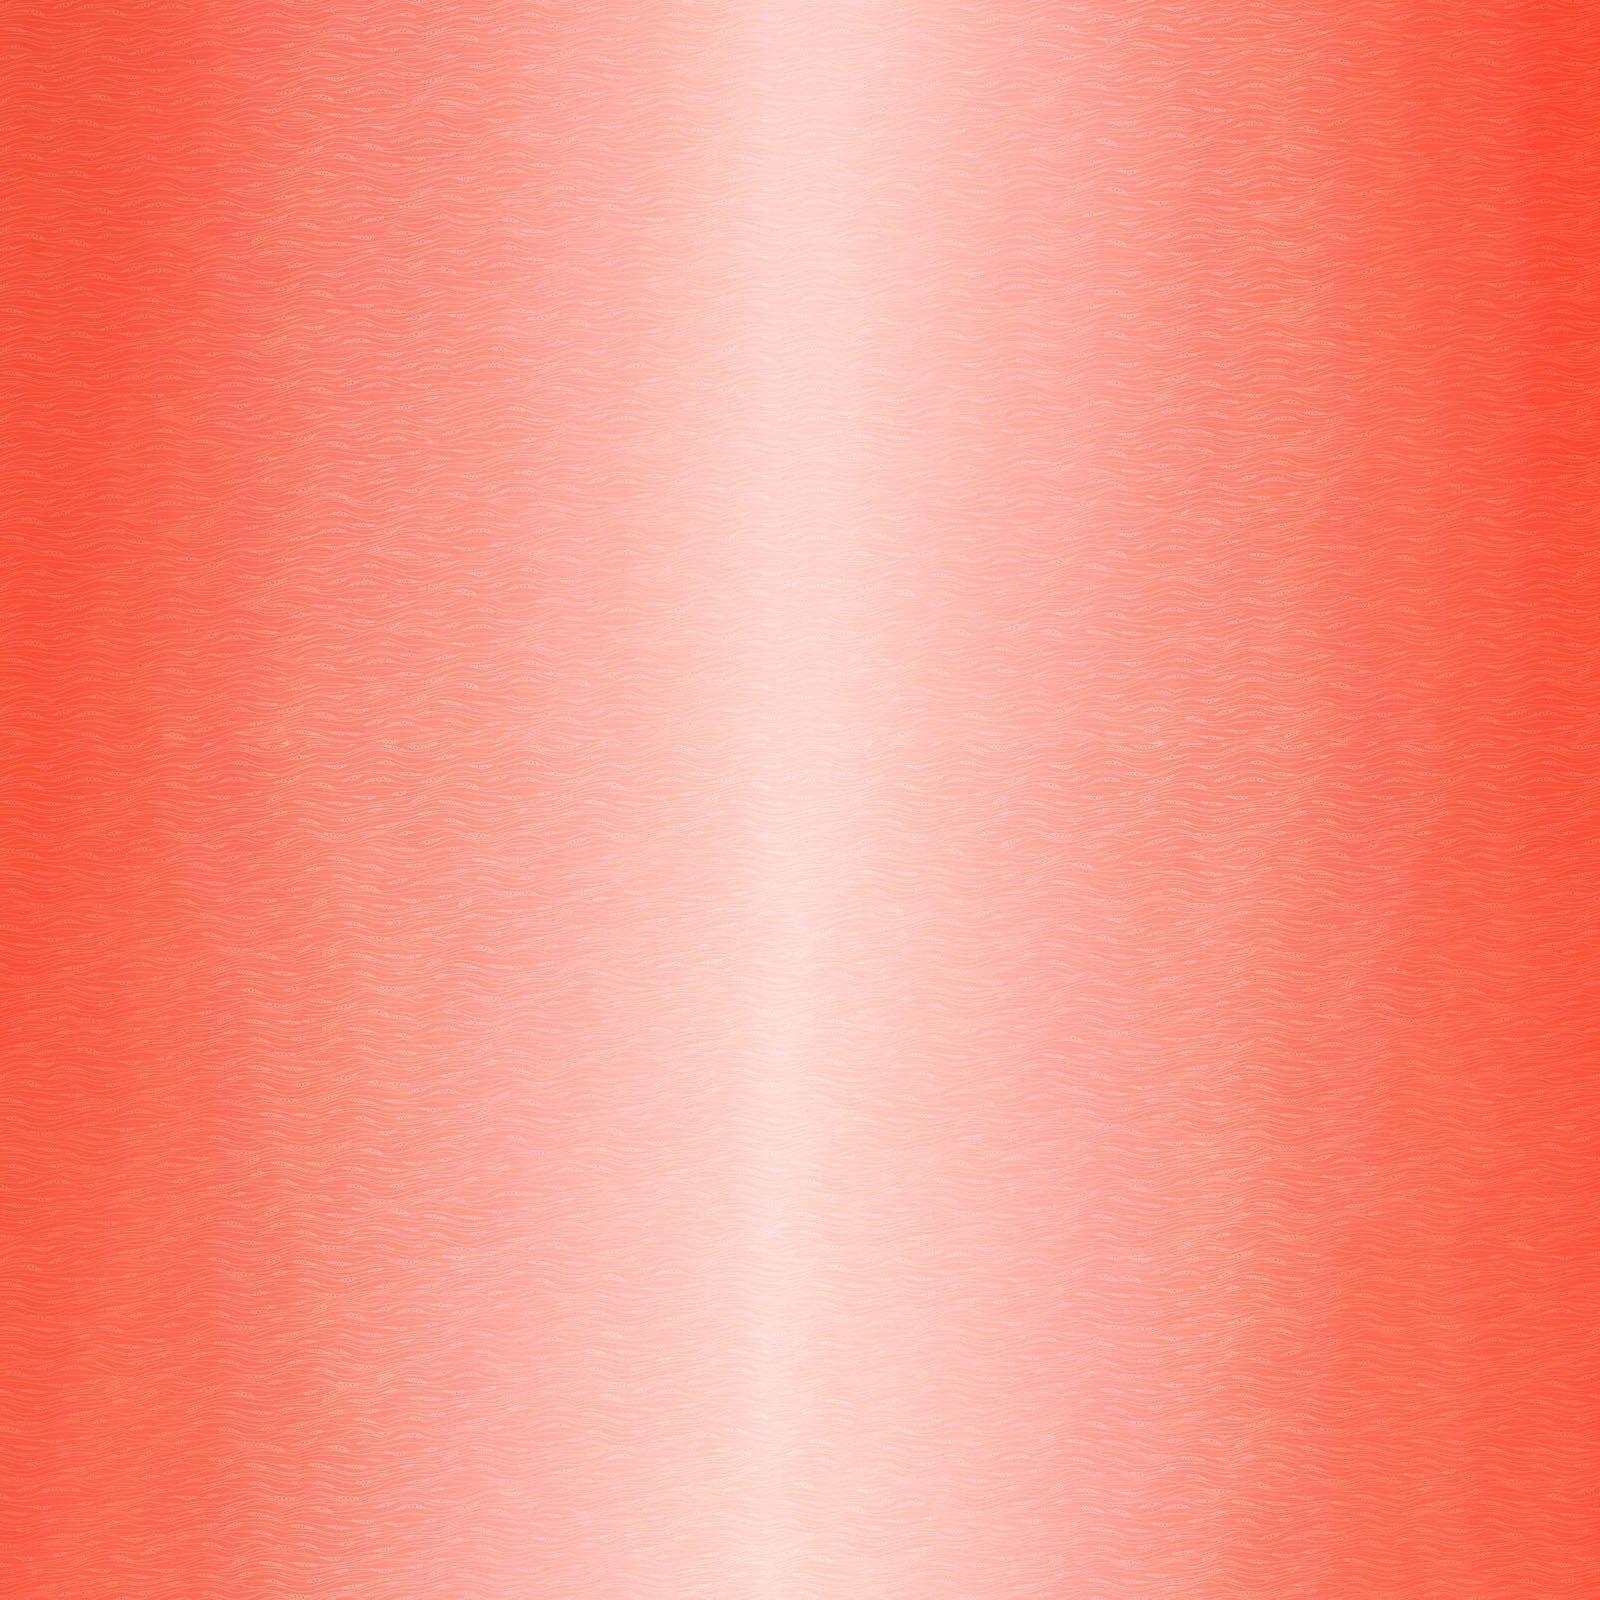 MAYWOOD MOONGATE, HORIZON OMBRÉ Orange, per cm or $18/m